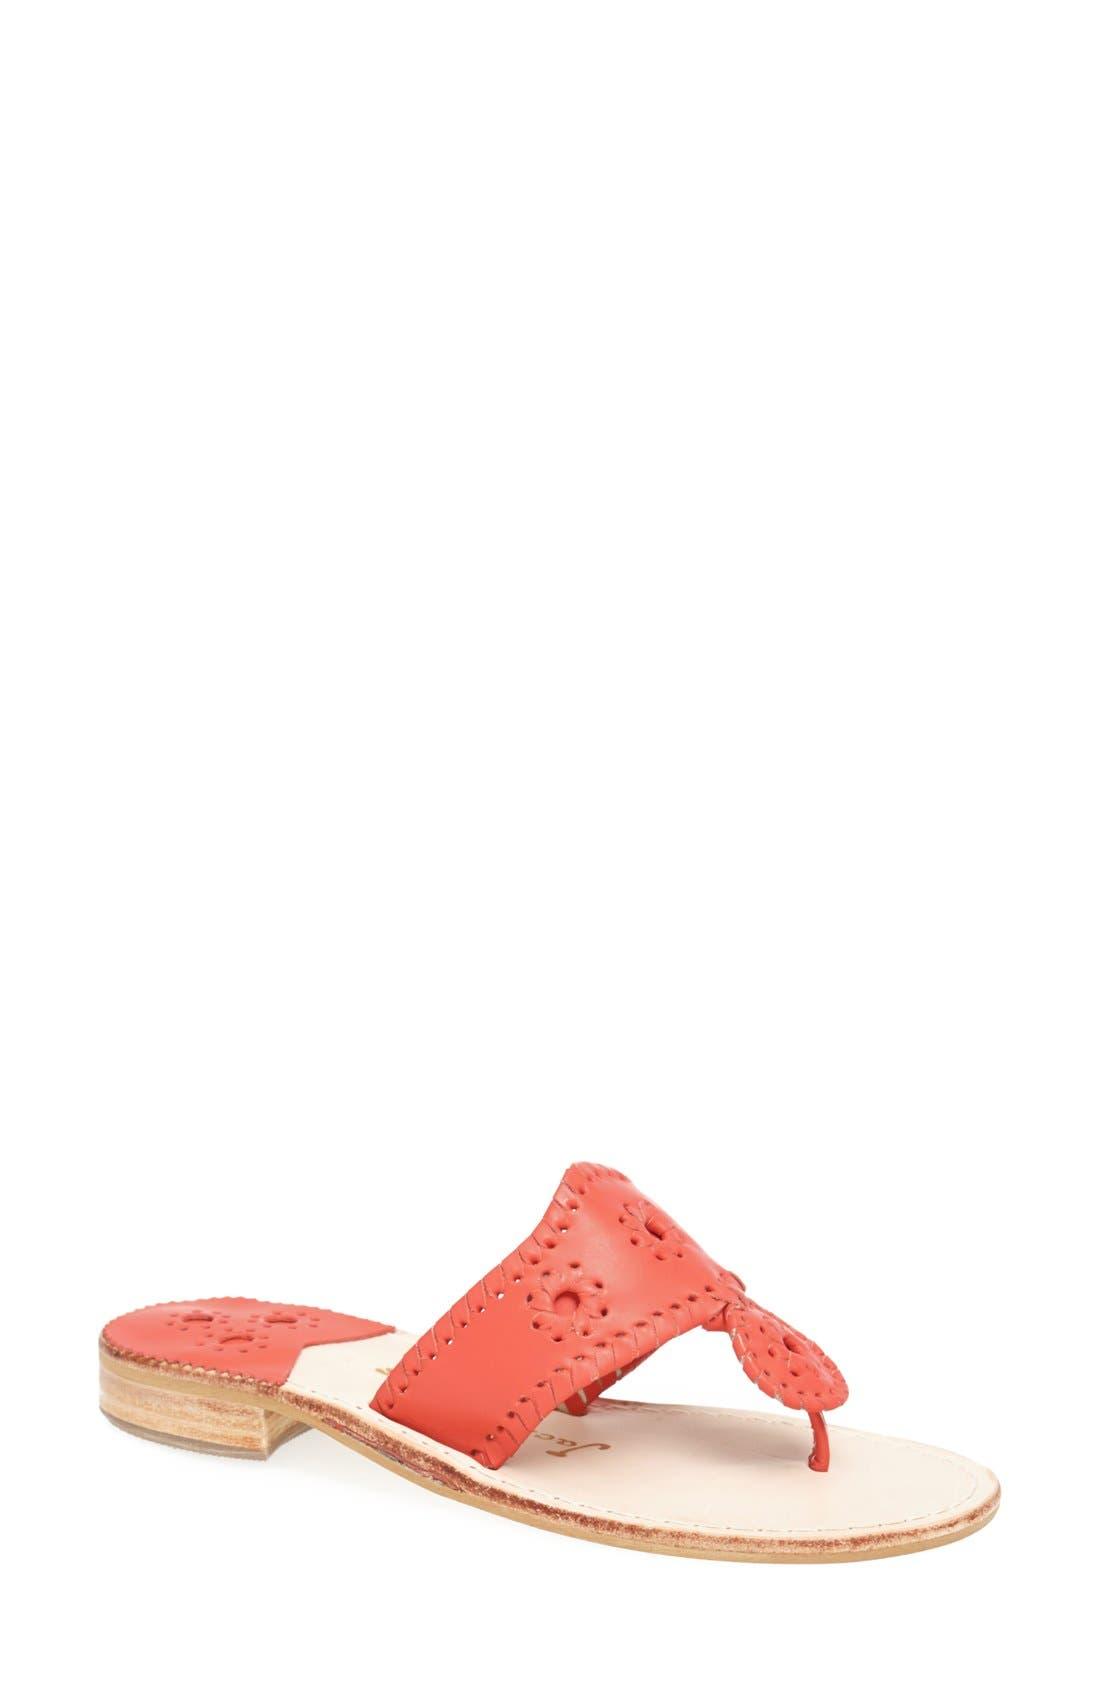 Alternate Image 1 Selected - Jack Rogers 'Nantucket' Leather Sandal (Women)